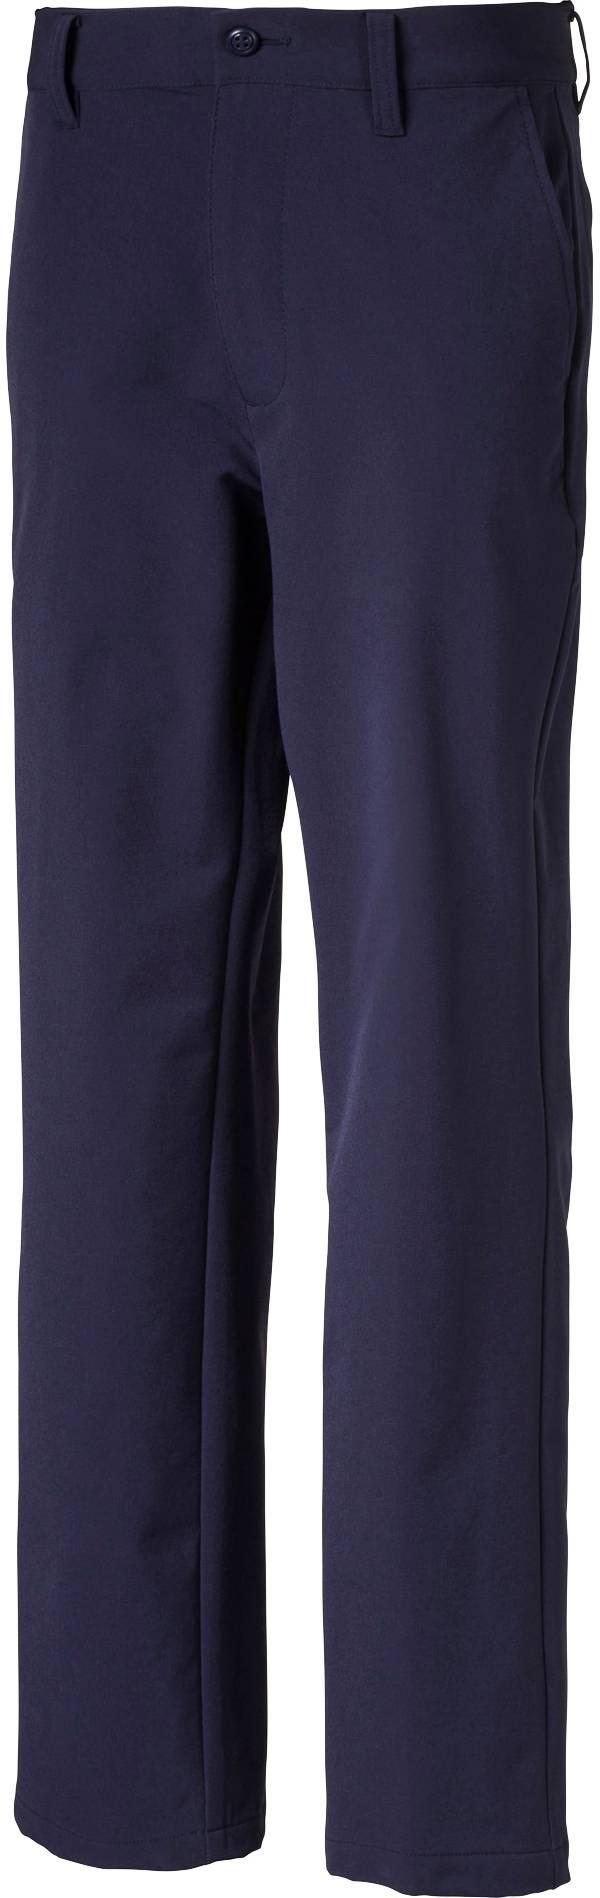 PUMA Boys' Stretch Utility Golf Pants product image